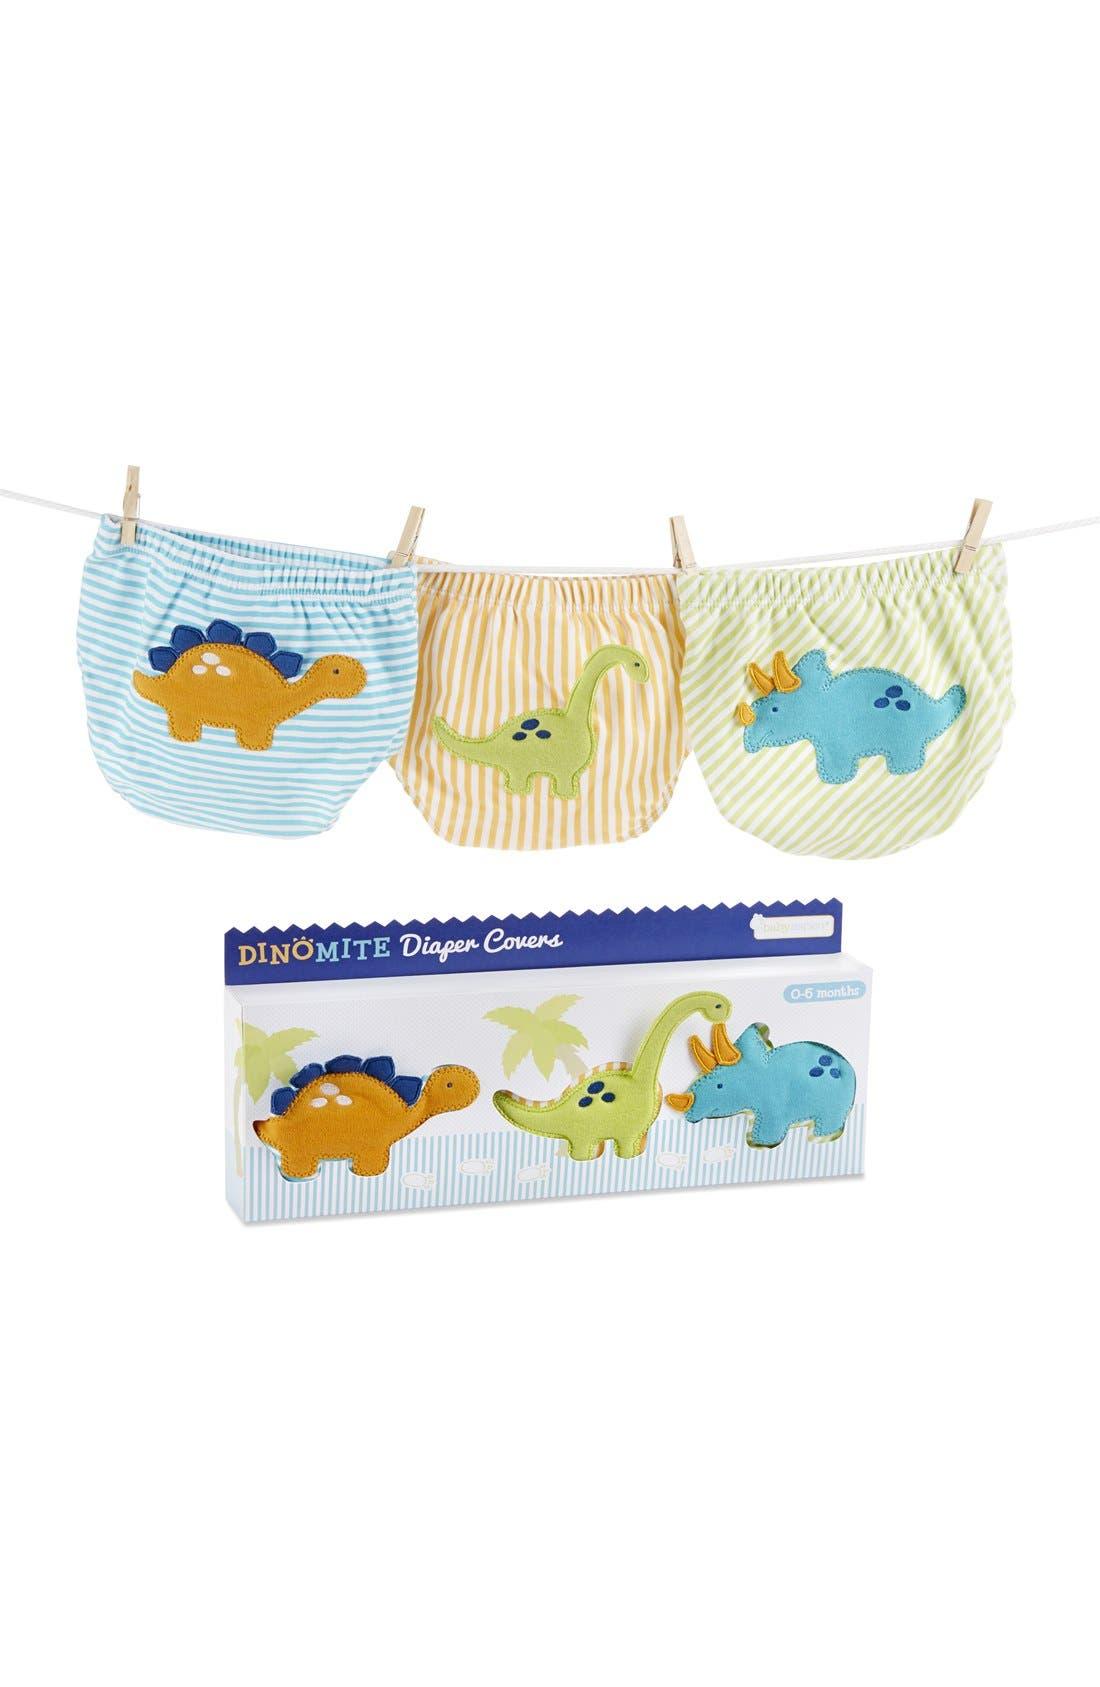 Alternate Image 1 Selected - Baby Aspen 'Dinomite' Diaper Covers (3-Pack) (Baby)